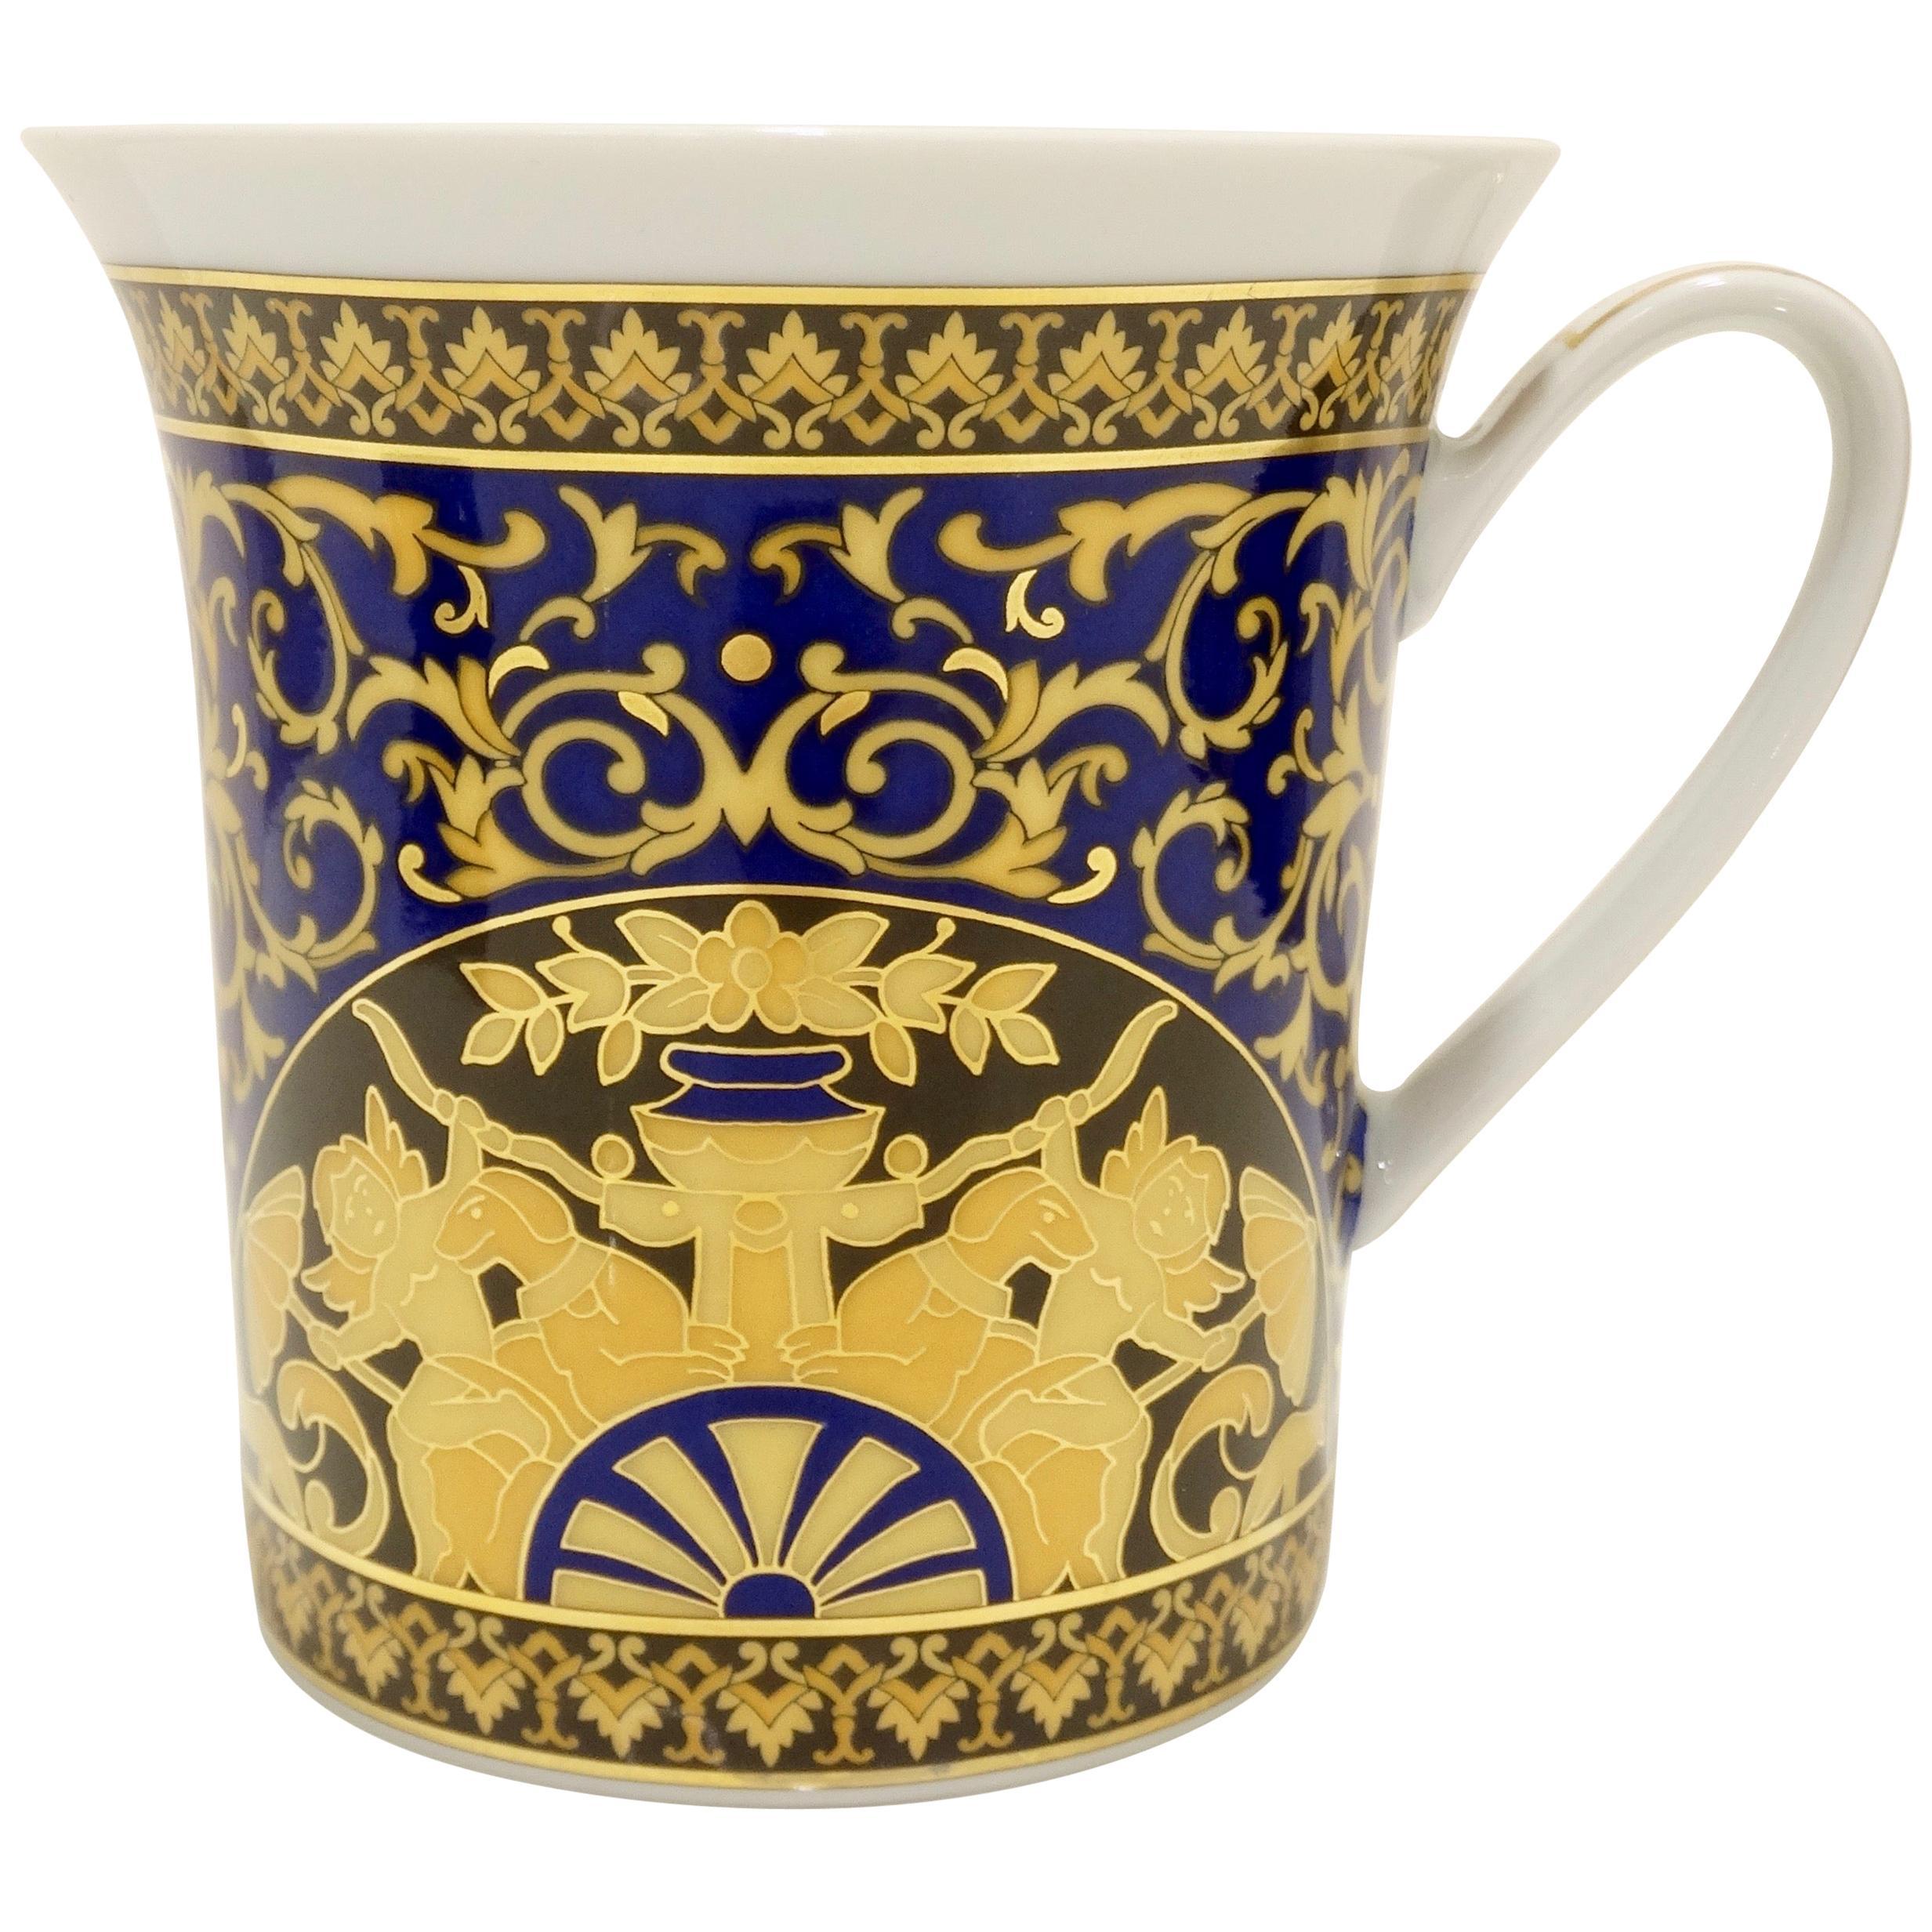 Versace 2000s Medusa Blue Porcelain Mug